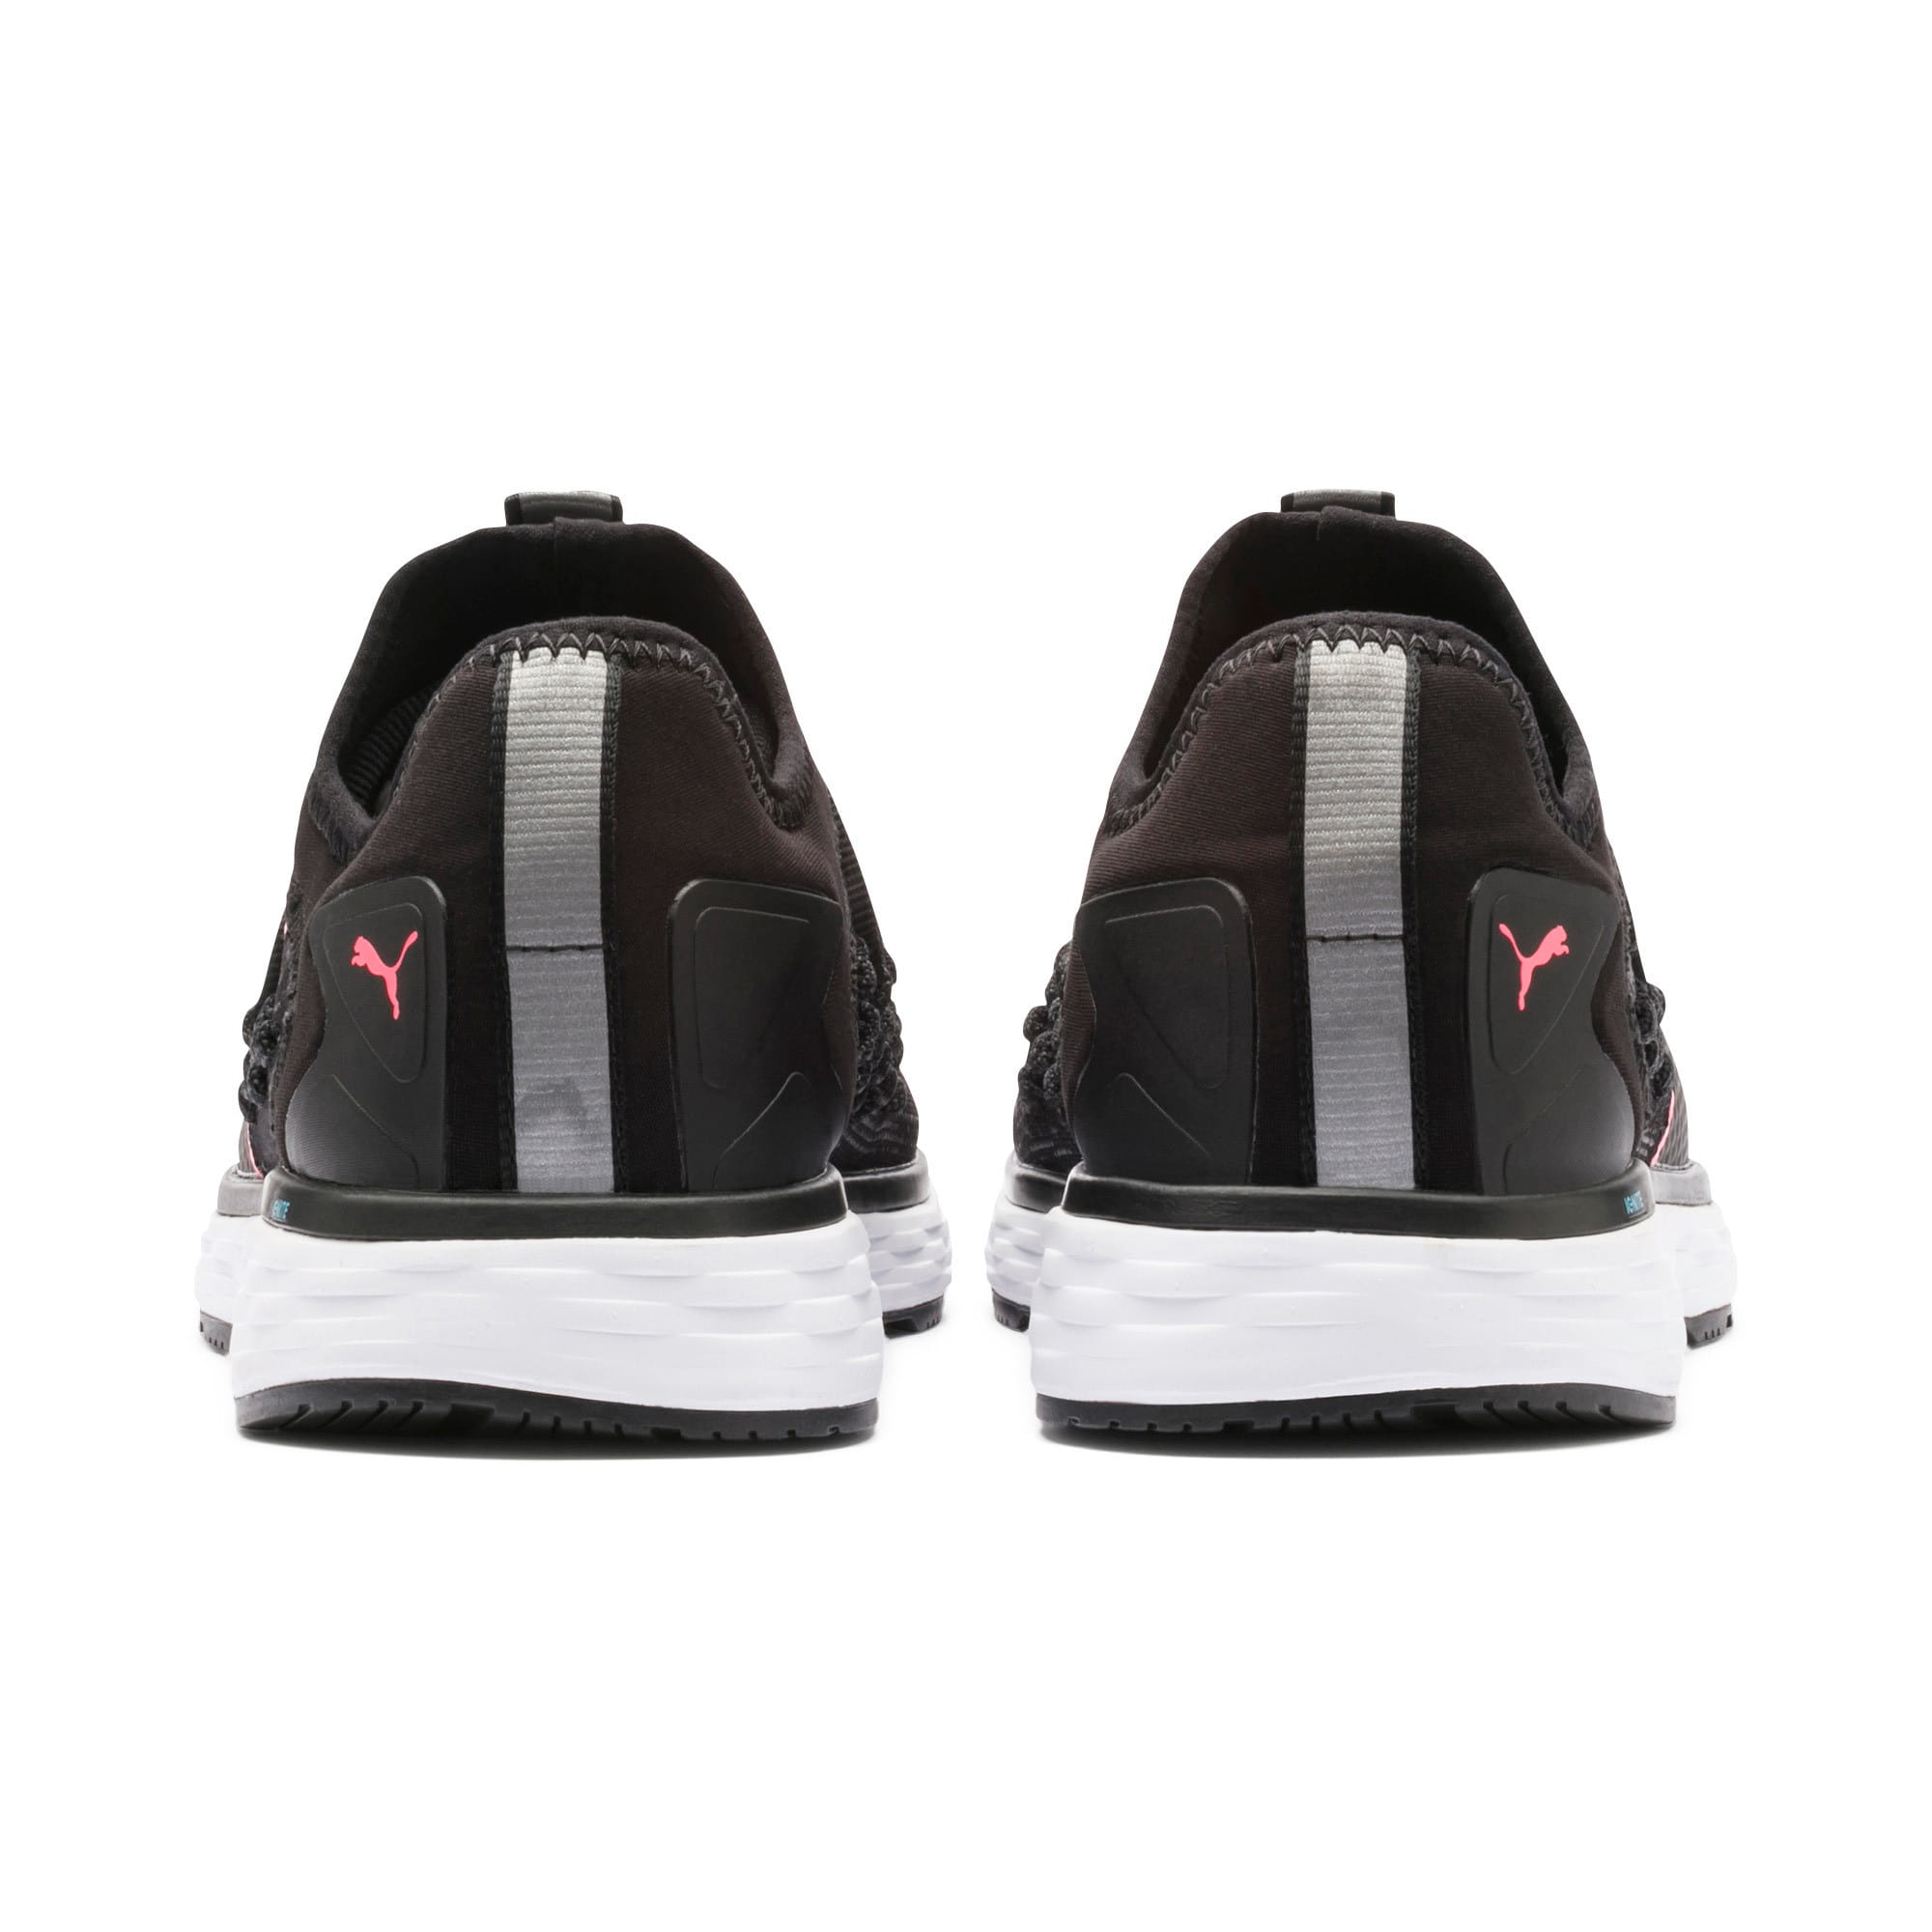 Thumbnail 5 of SPEED FUSEFIT Women's Running Shoes, Puma Black-Milky Blue, medium-IND